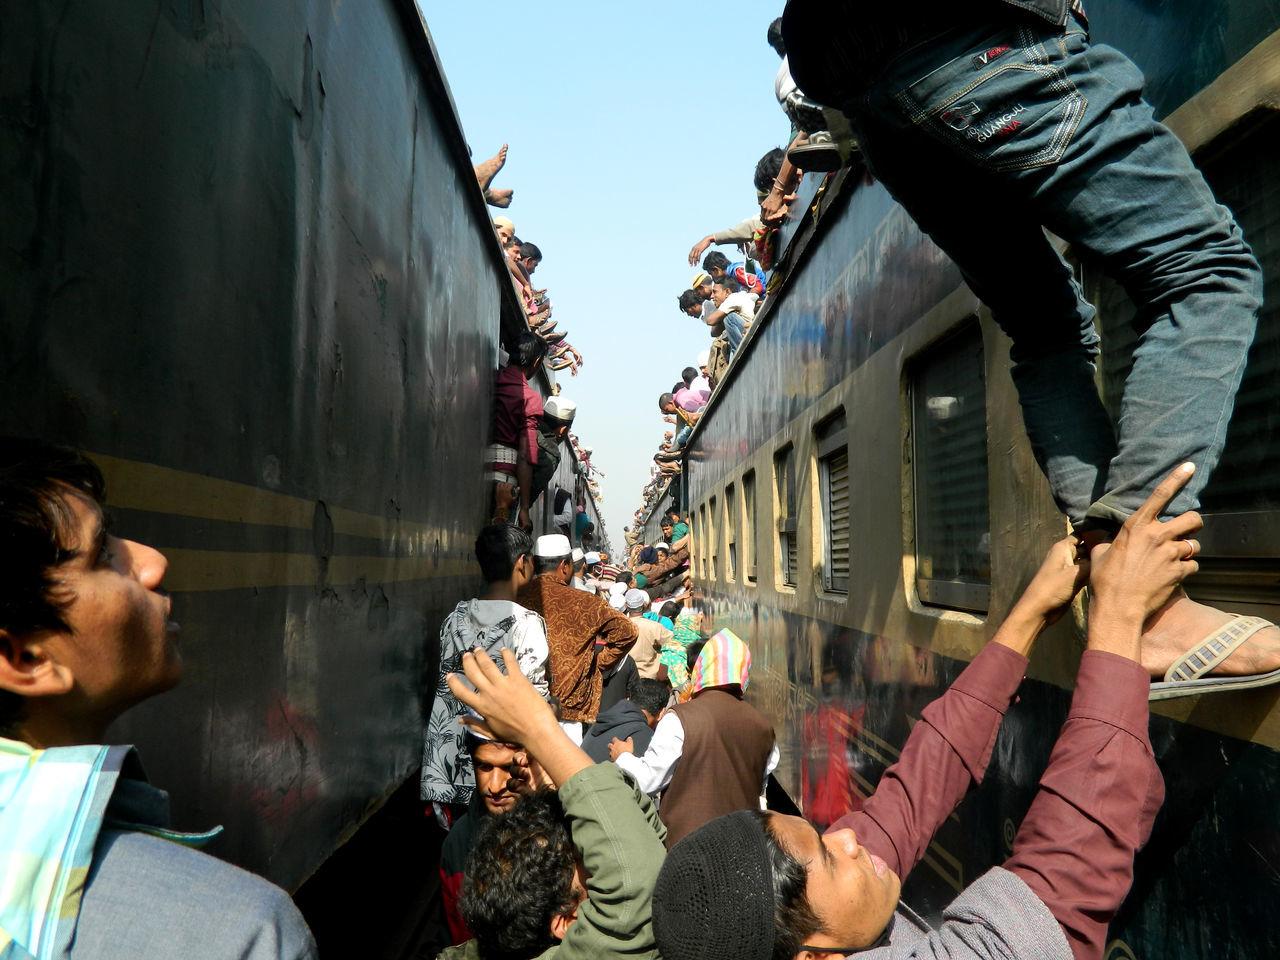 Crowd on train against sky